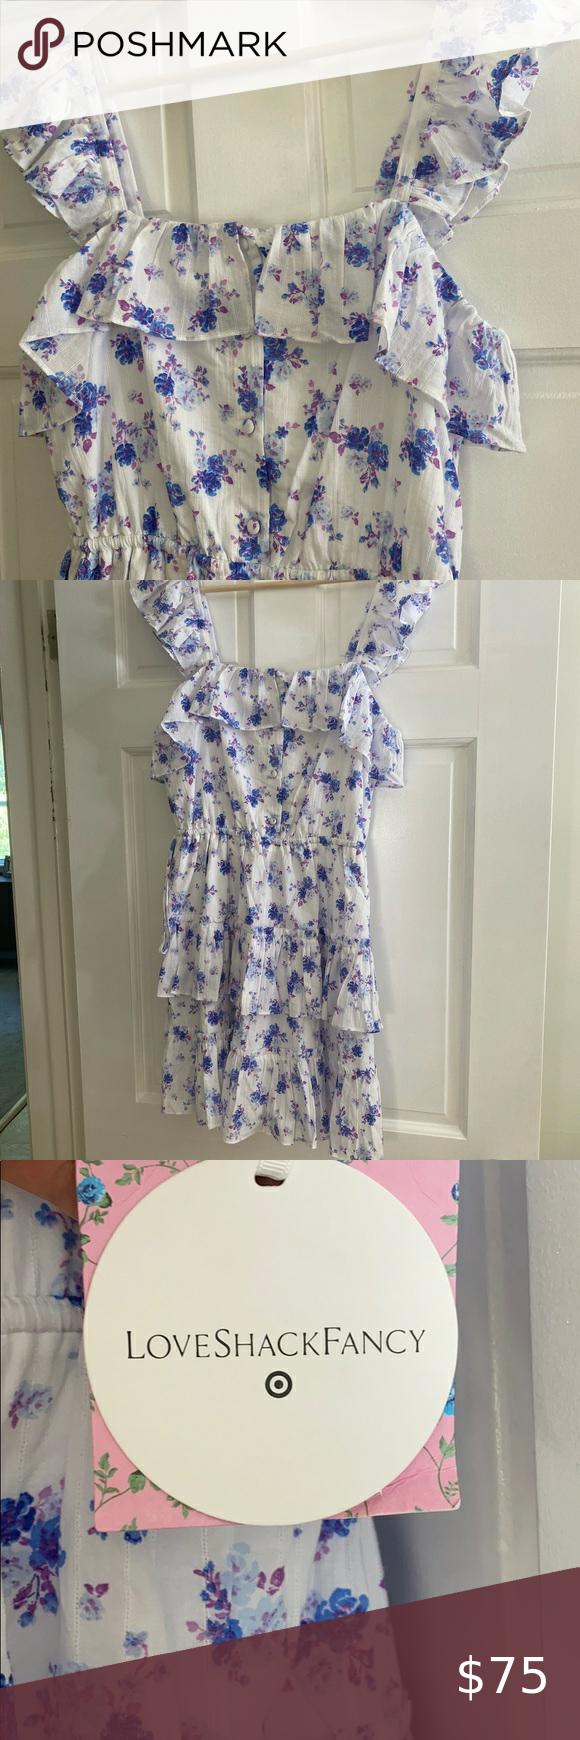 Loveshackfancy For Target Cute Summer Dresses Loveshackfancy Summer Dresses [ 1740 x 580 Pixel ]